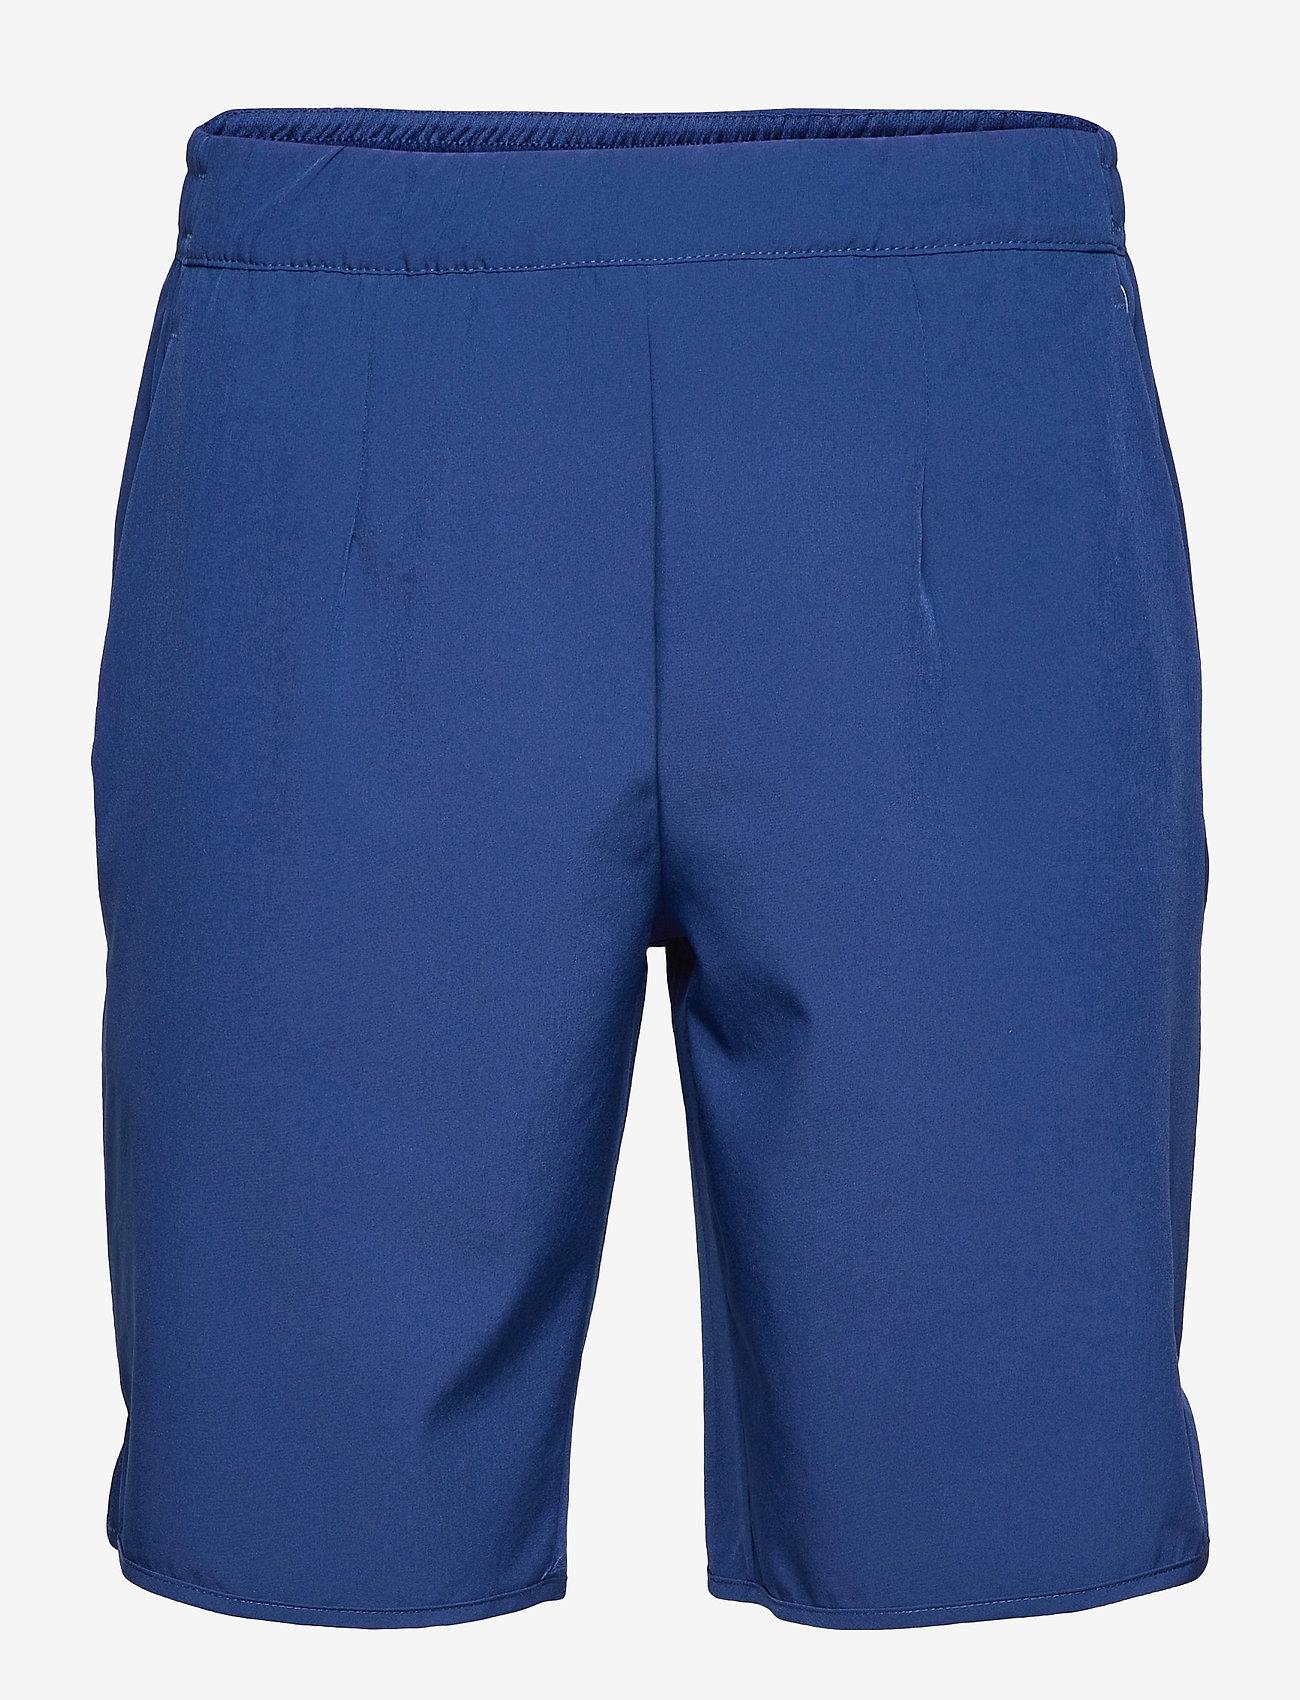 BIDI BADU - Henry 2.0 Tech Shorts - training korte broek - dark blue - 0